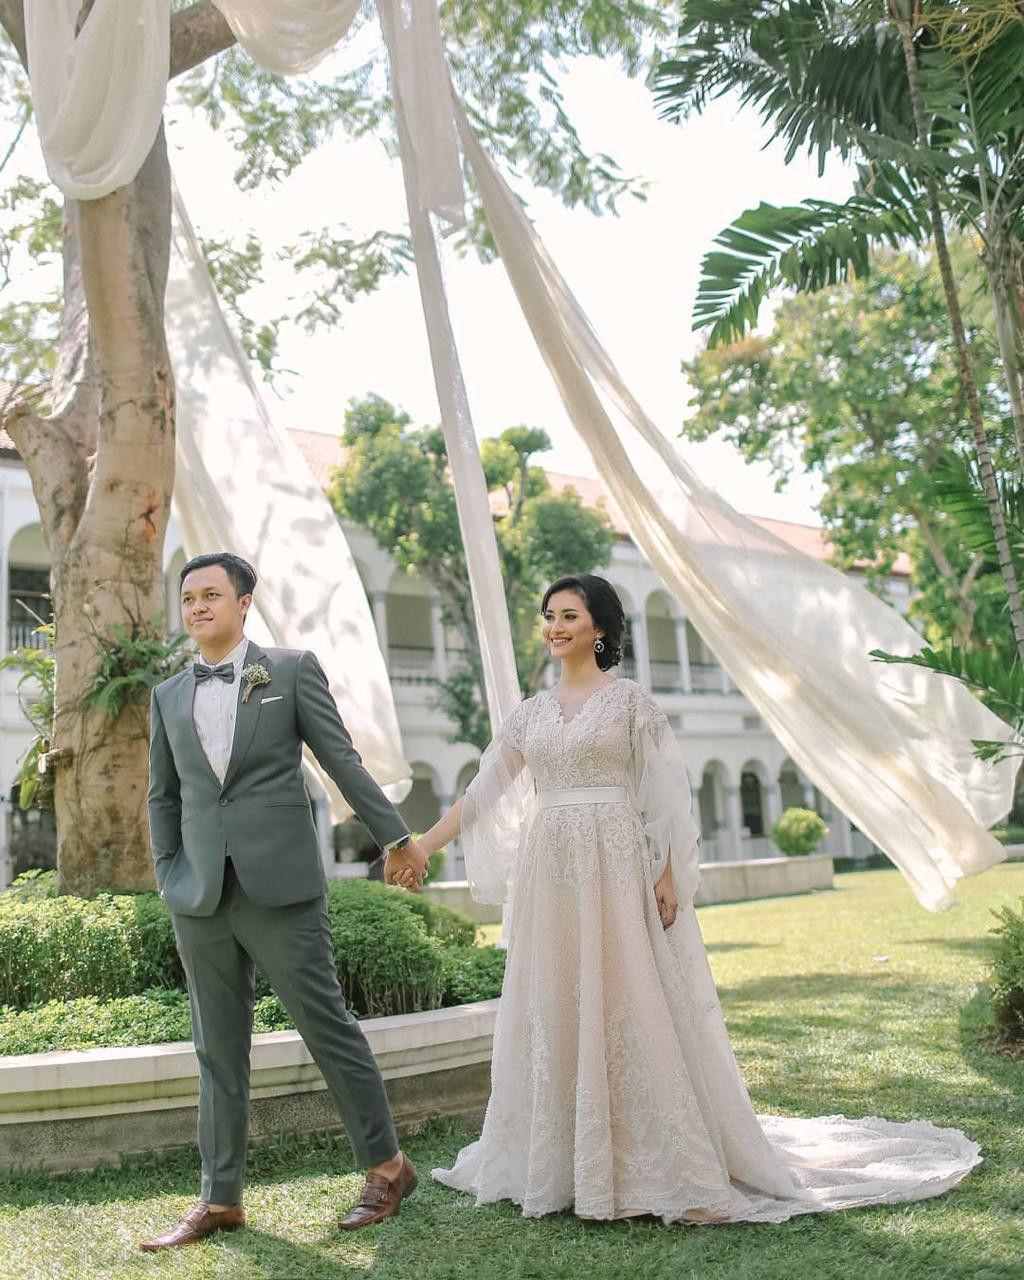 Inspirasi Tema Pernikahan Sederhana Tapi Berkesan